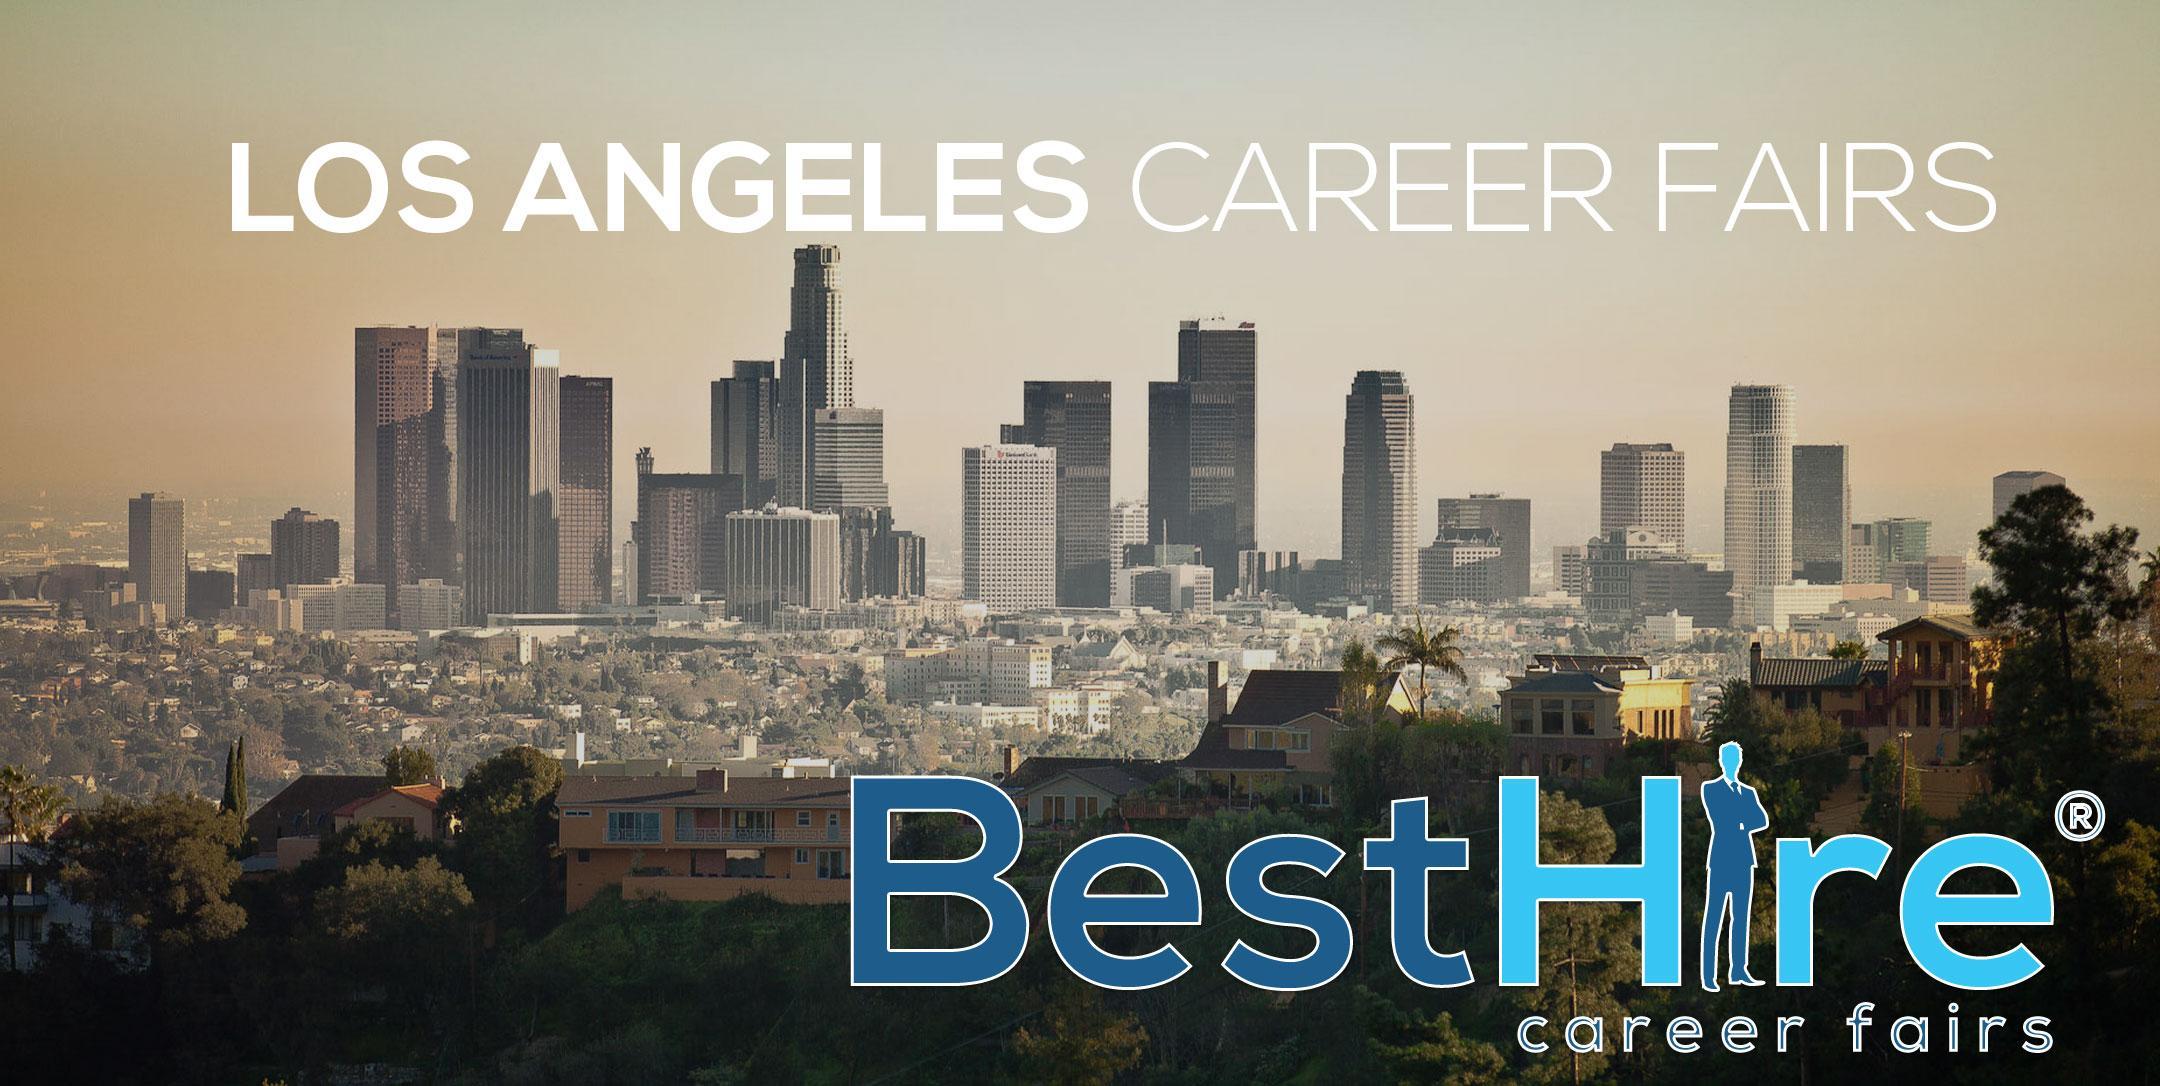 Los Angeles Career Fair - October 18, 2018 Job Fairs & Hiring Events in Los Angeles CA